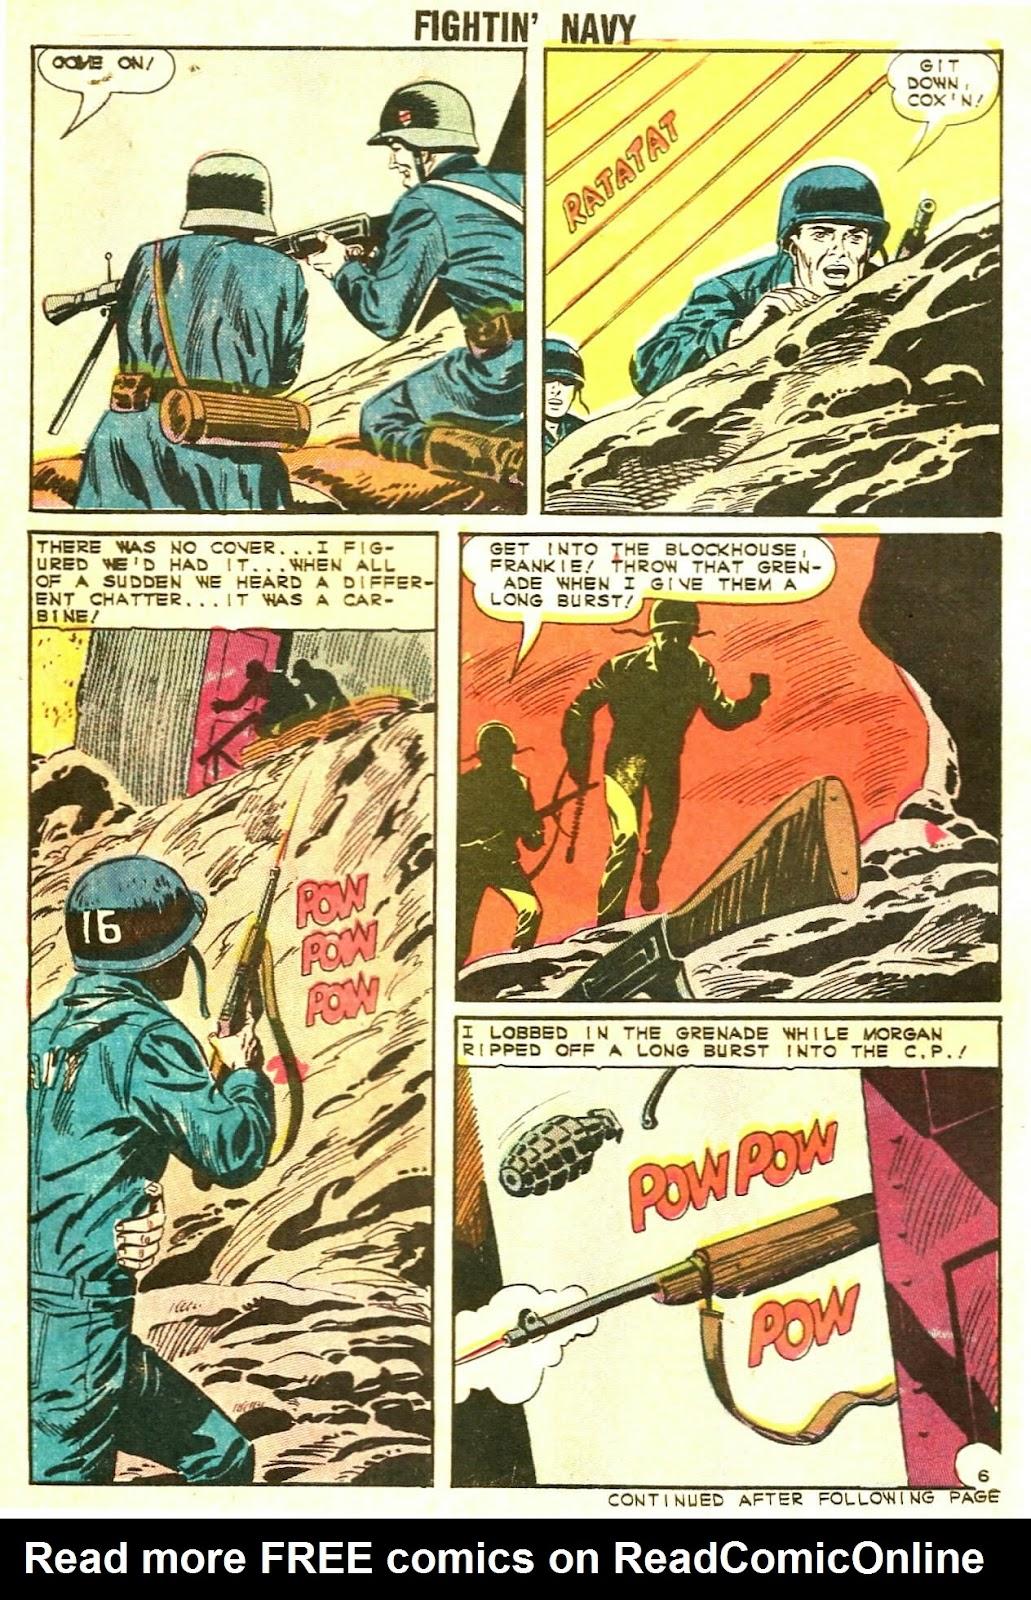 Read online Fightin' Navy comic -  Issue #117 - 30